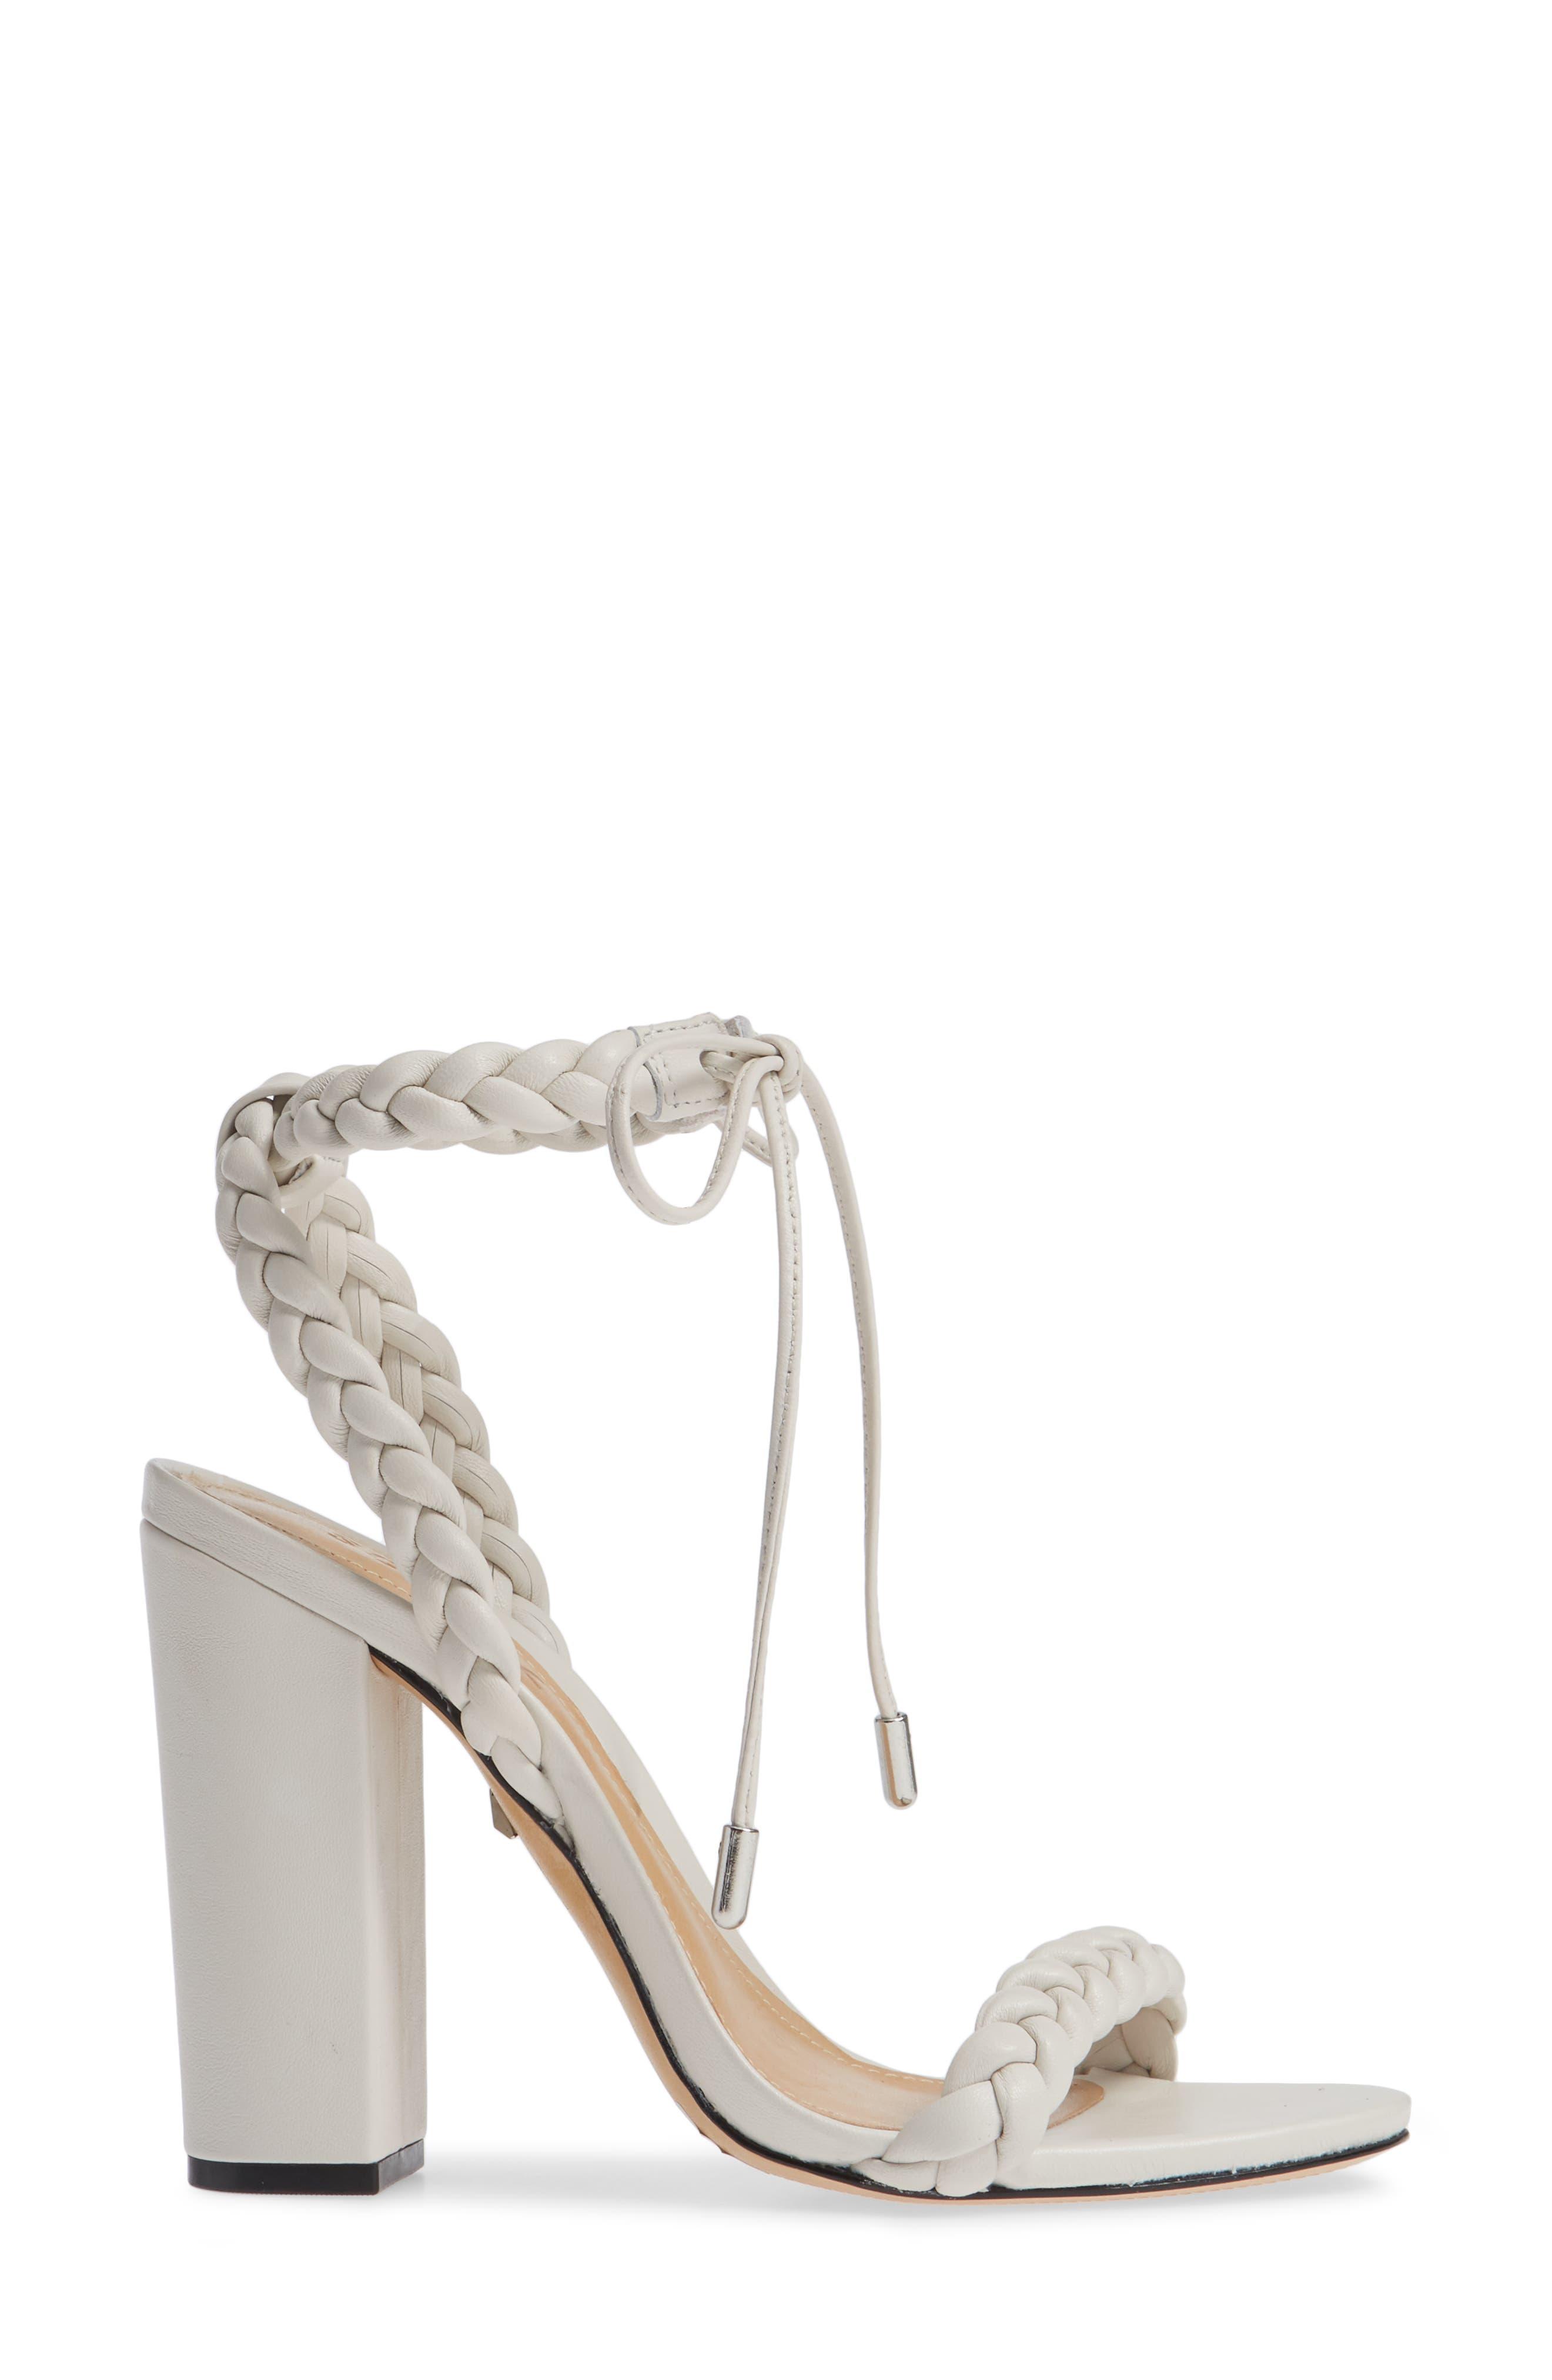 Lainna Braided Strap Sandal,                             Alternate thumbnail 3, color,                             PEARL